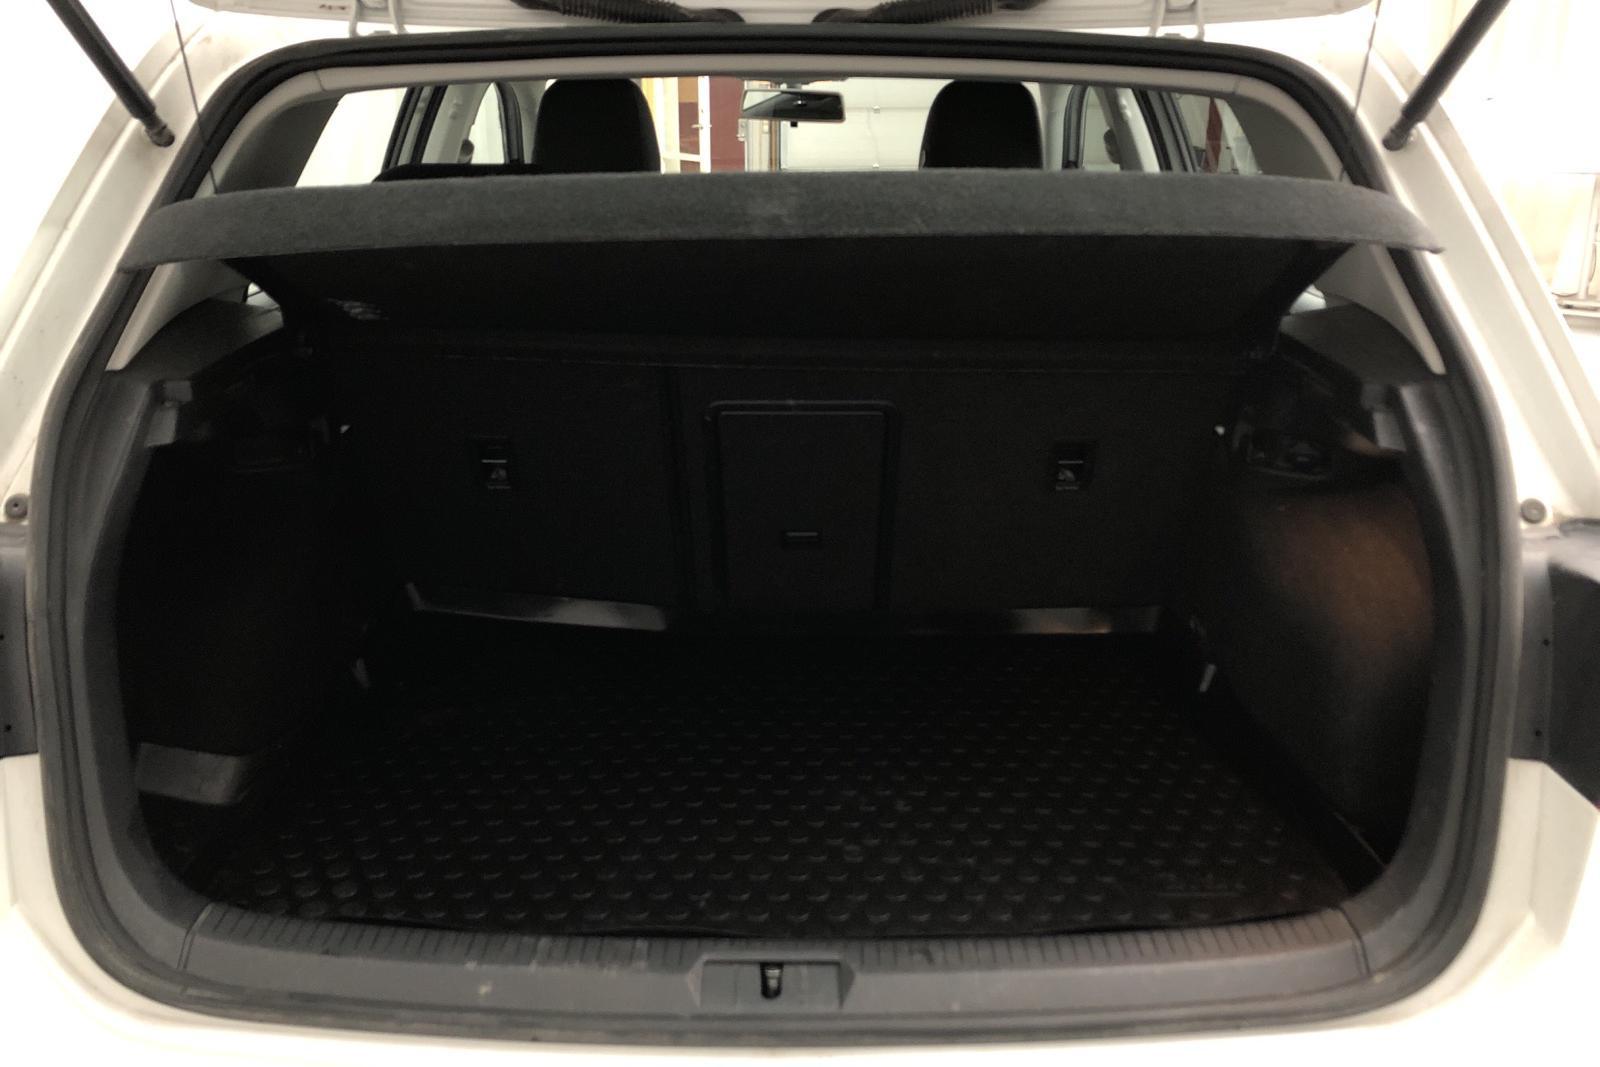 VW Golf VII 1.6 TDI BlueMotion 5dr 4Motion (110hk) - 124 980 km - Manual - white - 2016